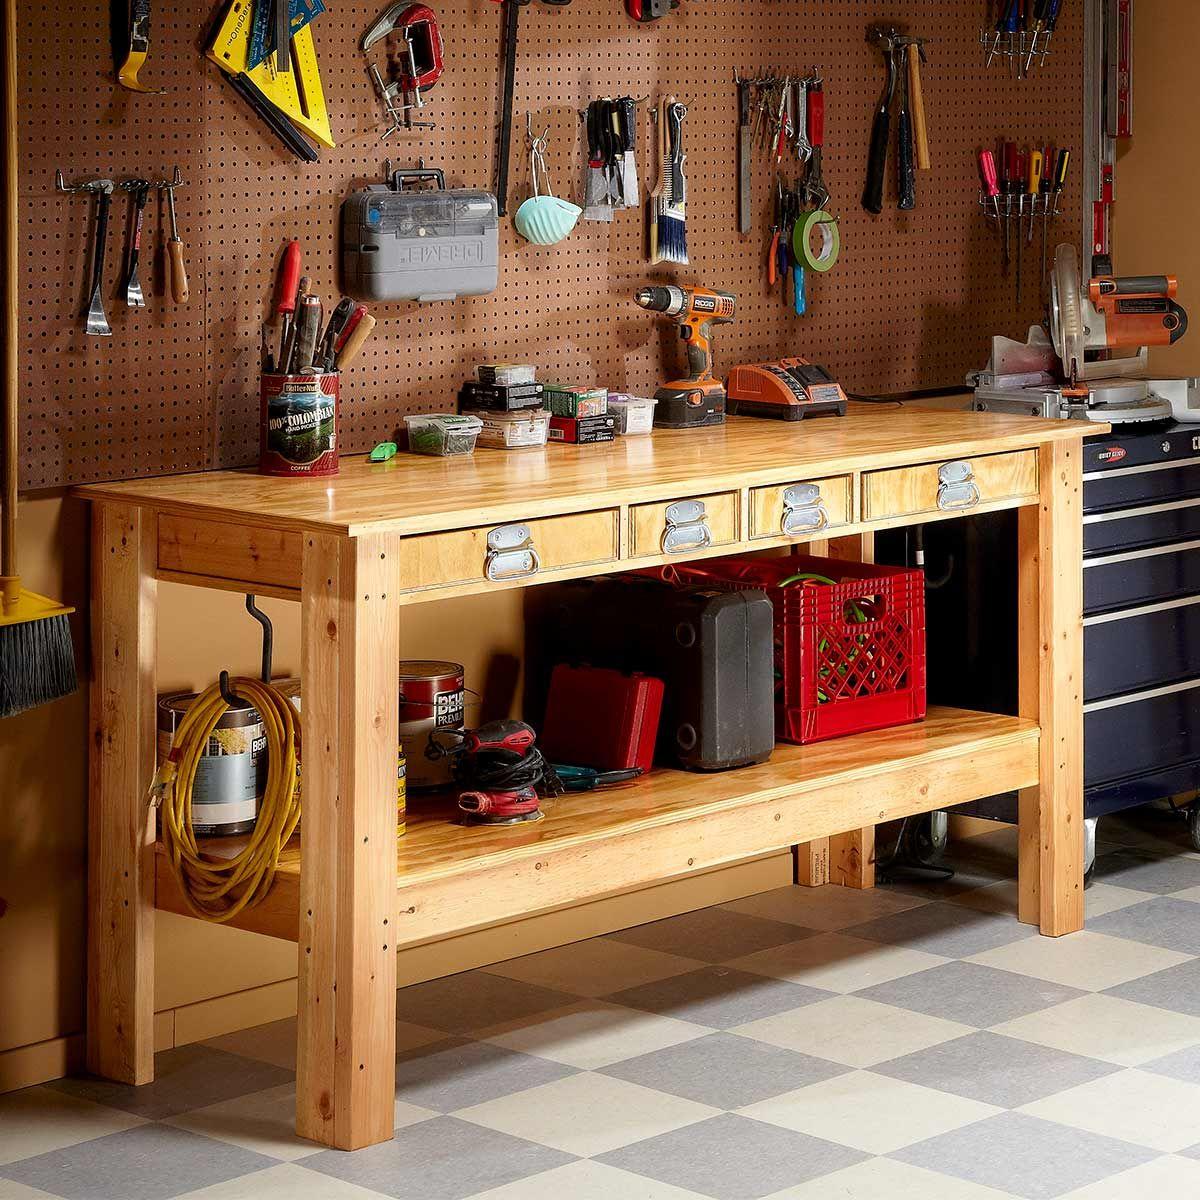 Simple Workbench Plans Simple workbench plans, Garage